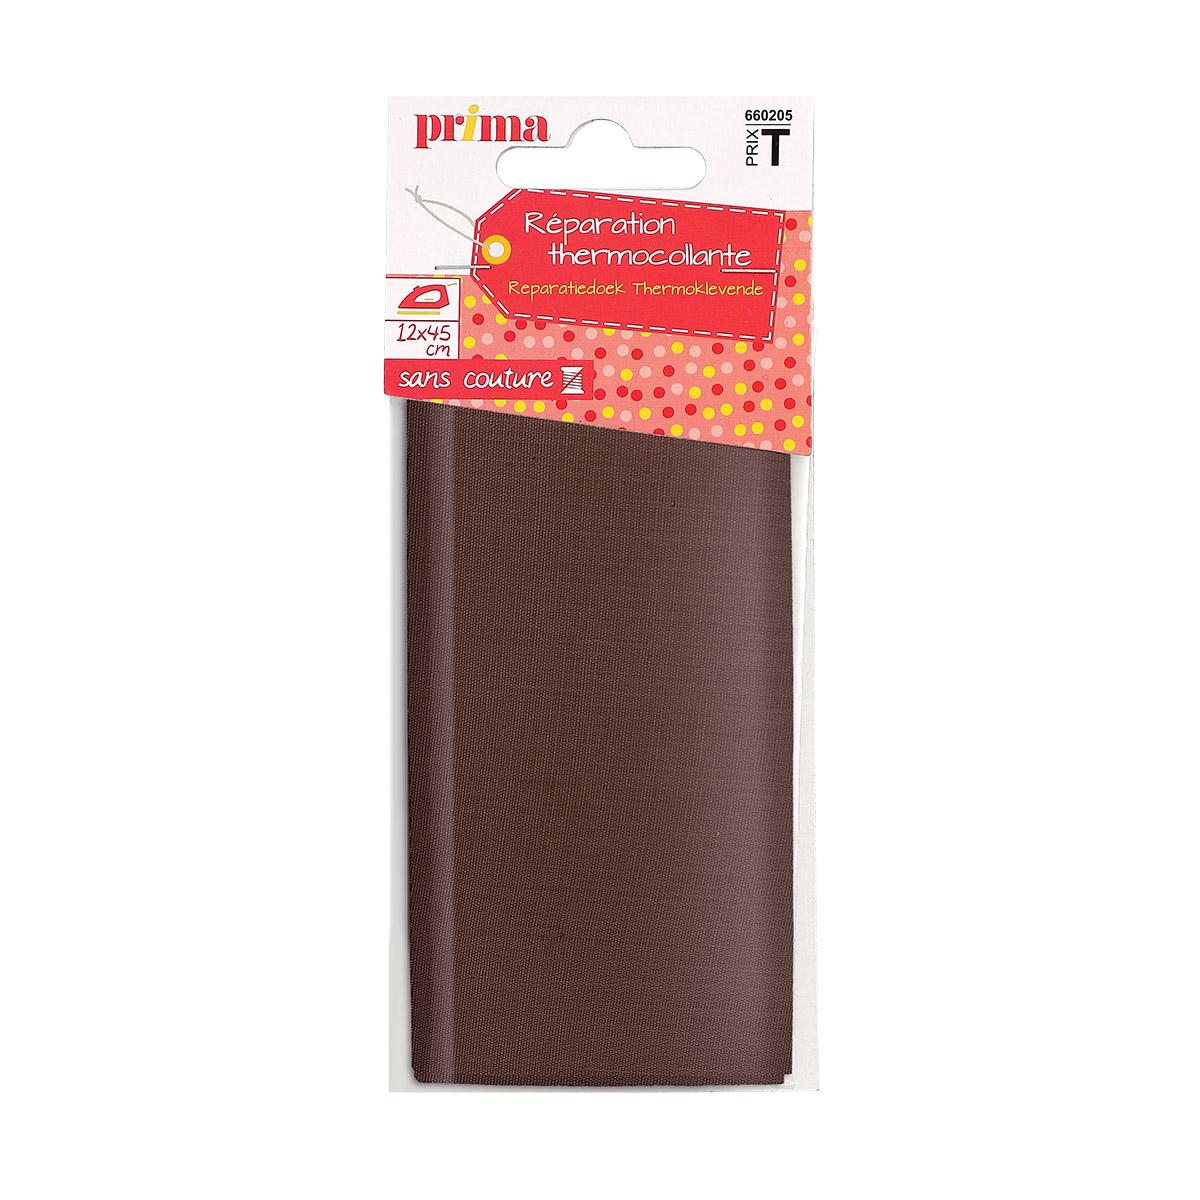 Tissu thermocollant marron avec pack - Prima Mercerie